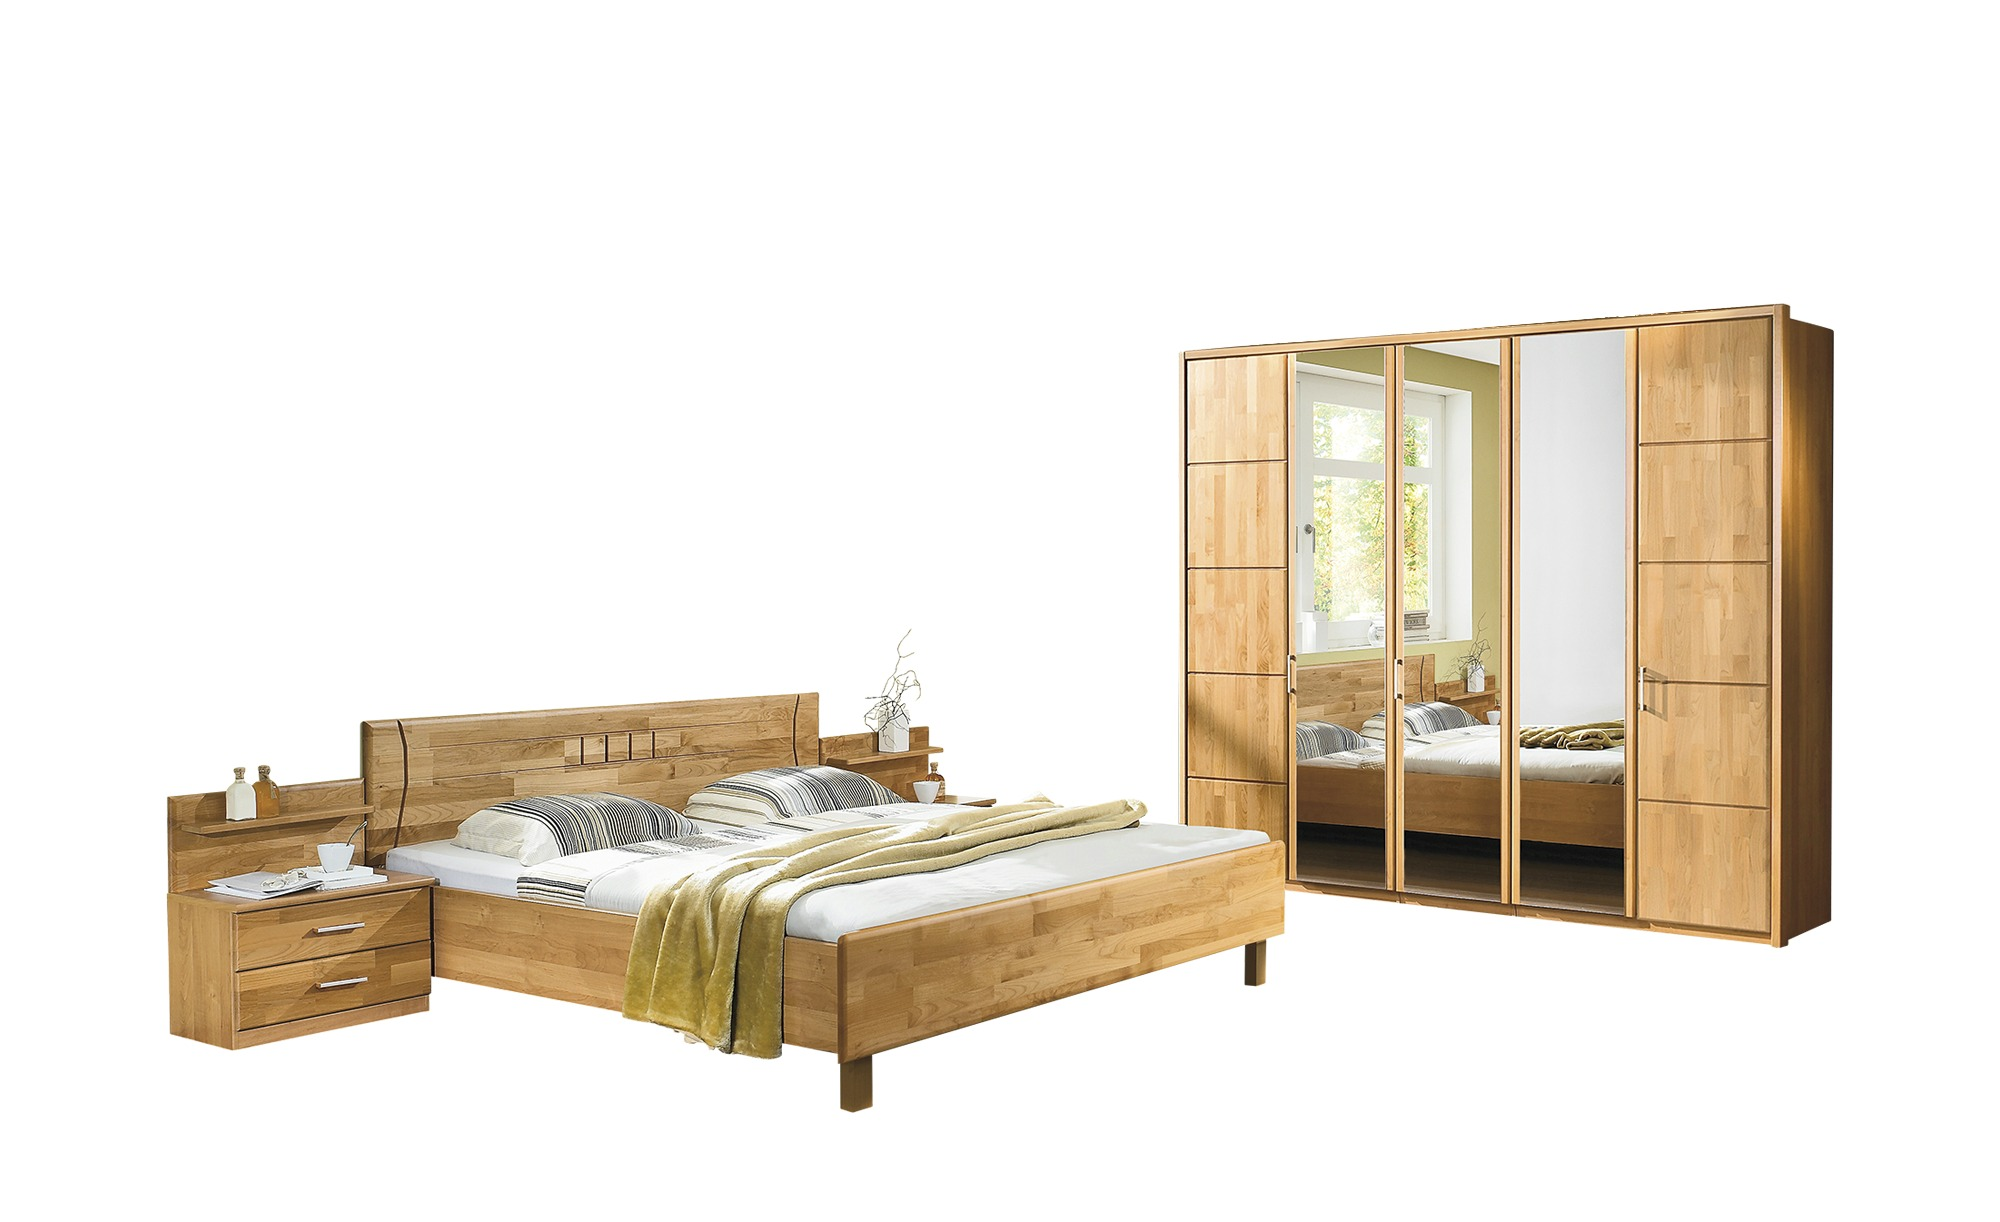 Woodford Komplett-Schlafzimmer 3-teilig  Belisa ¦ holzfarben ¦ Maße (cm): B: 256 H: 216 T: 58 Komplett-Schlafzimmer - Höffner